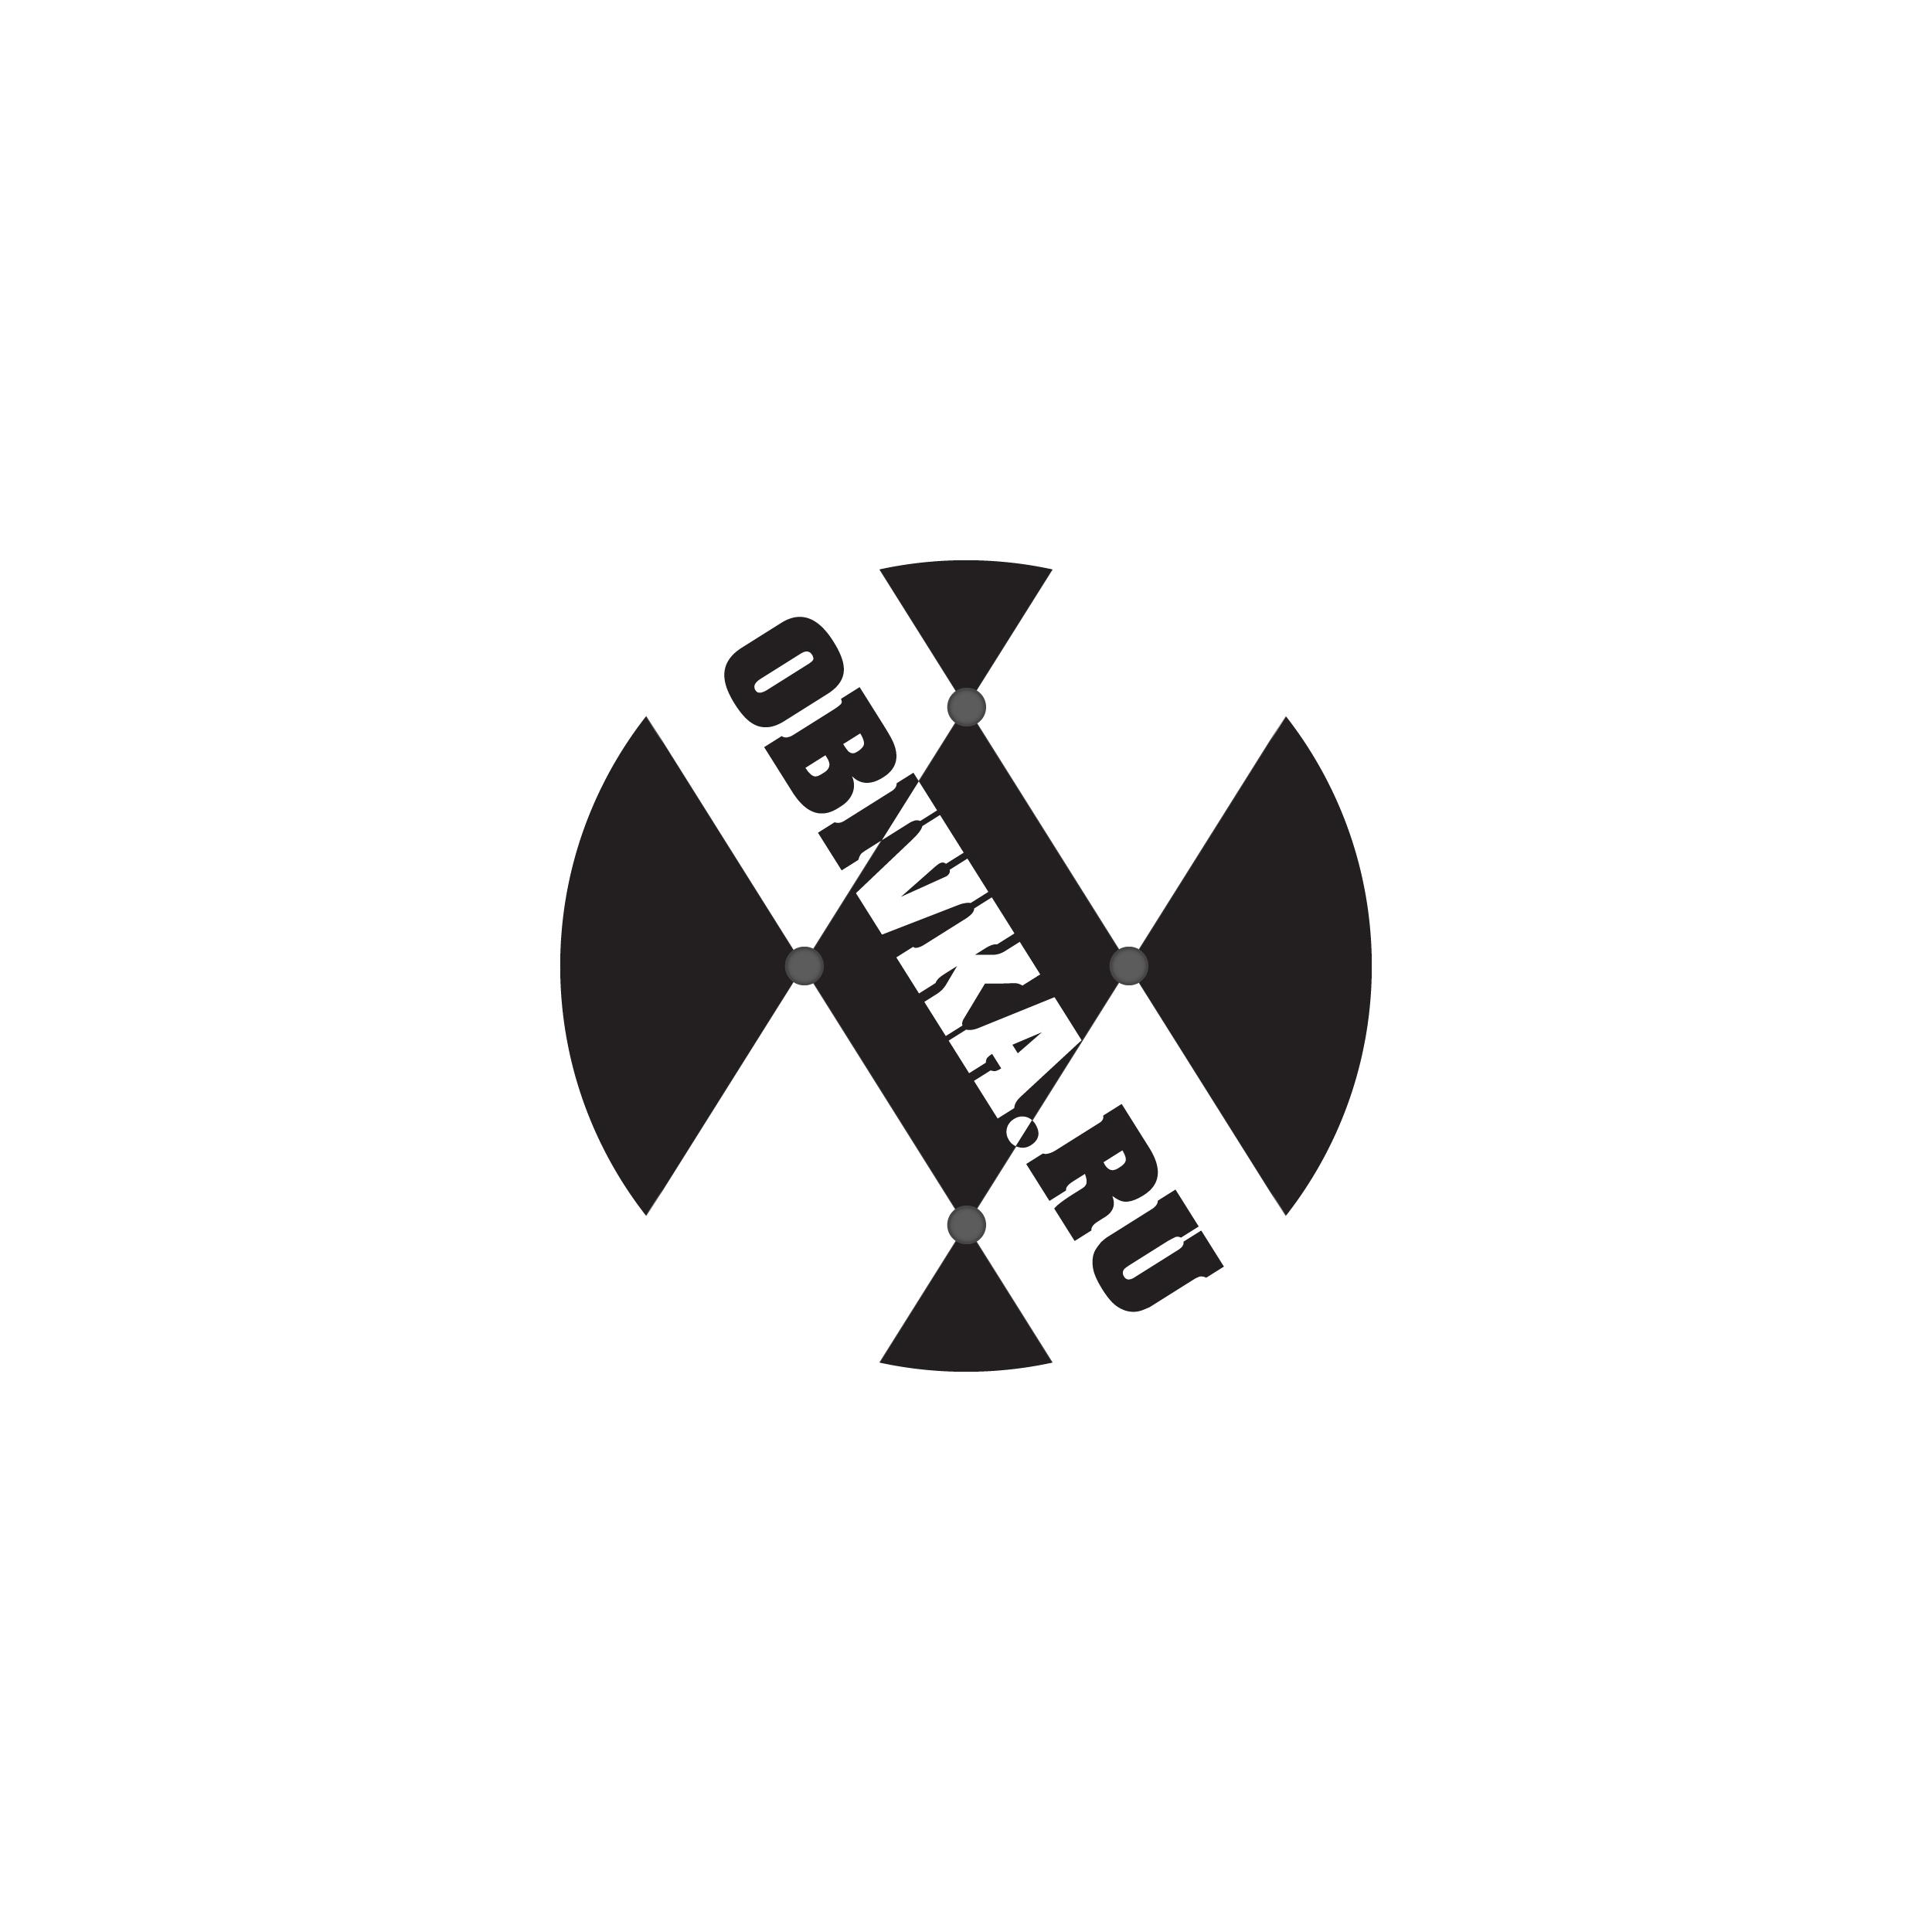 Логотип для сайта OBIVKA.RU фото f_8655c10f9219c848.jpg